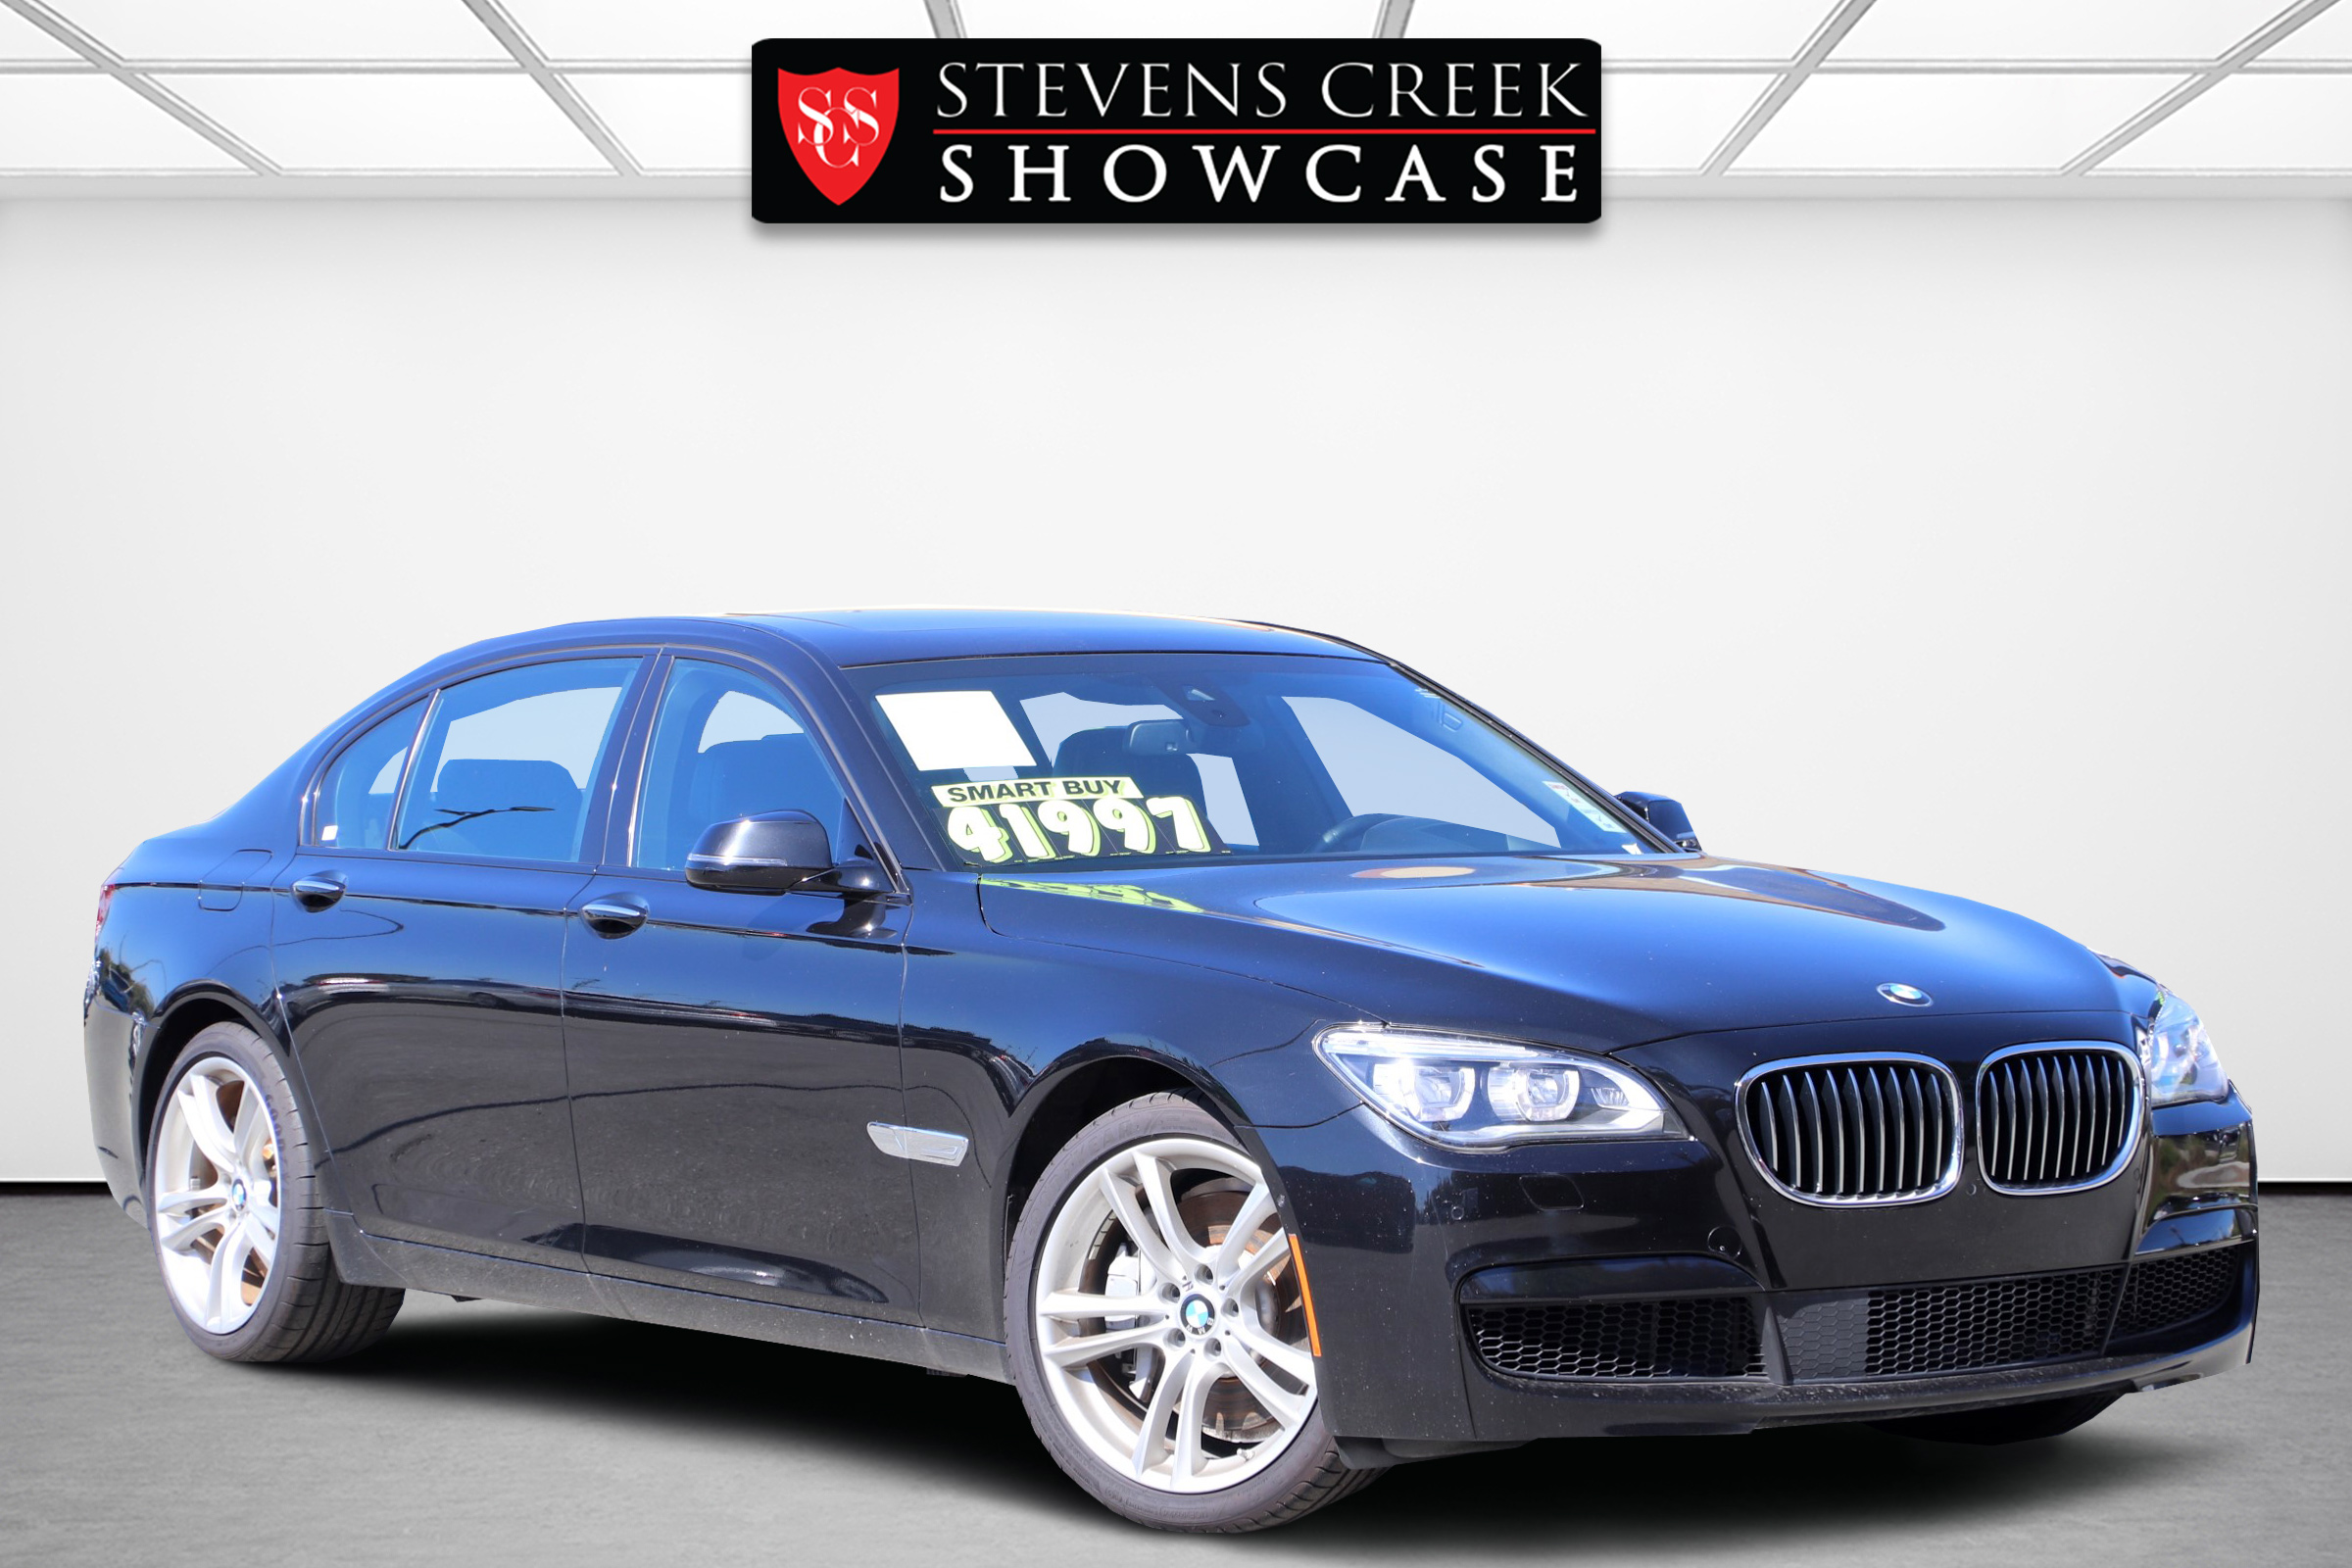 BMW Of Stevens Creek >> Used Bmw For Sale San Jose Ca Stevens Creek Showcase